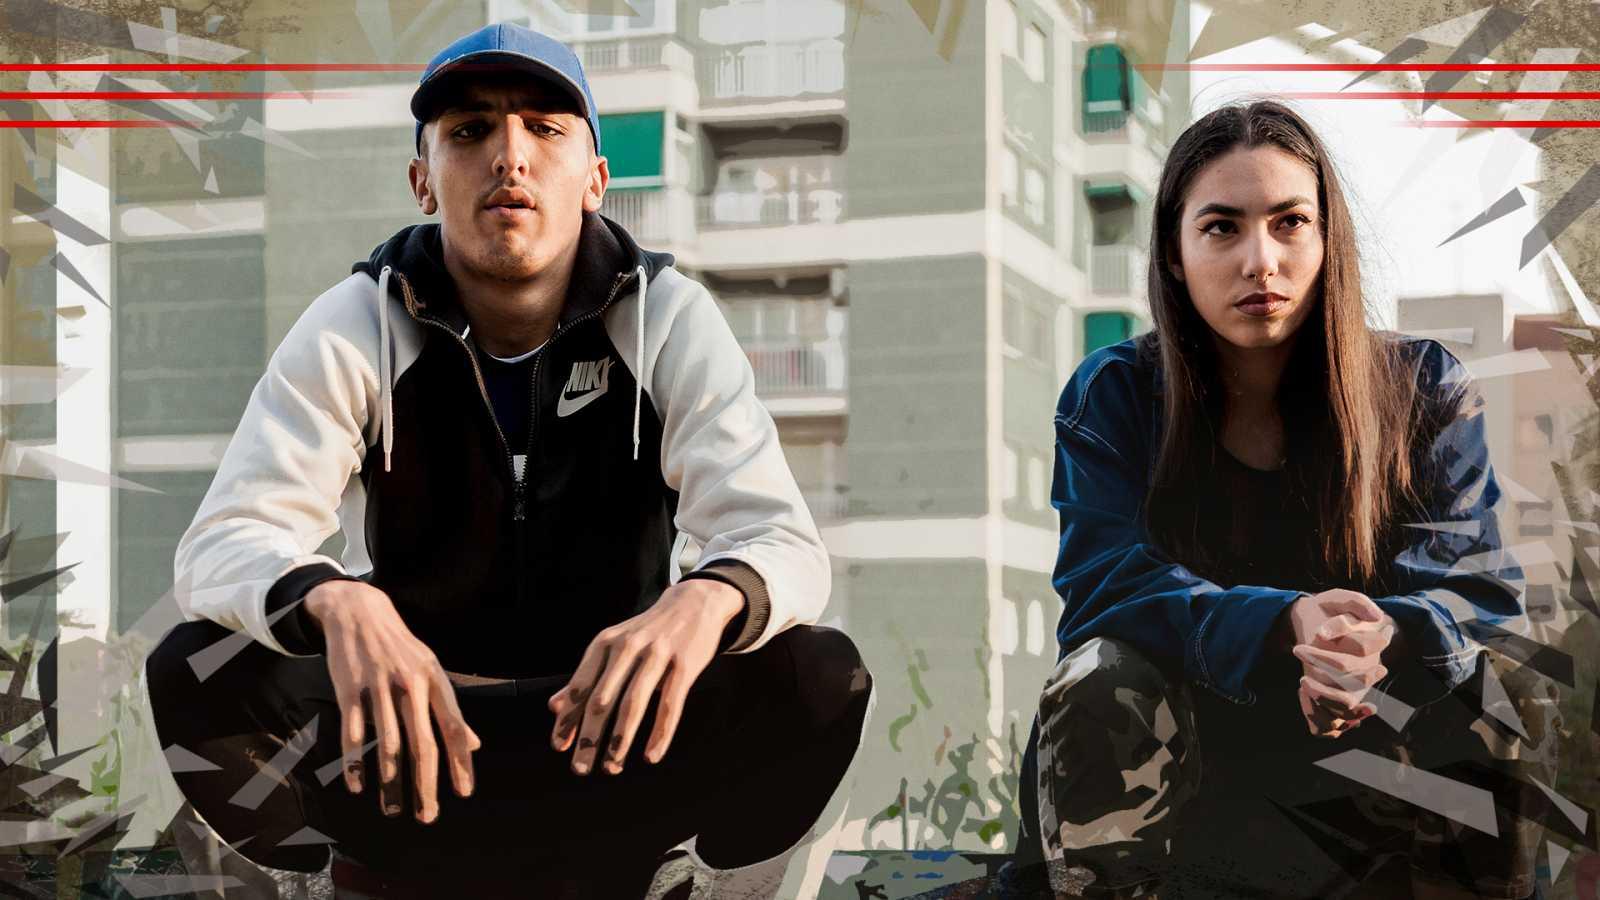 El 'Futuro' de la música urbana